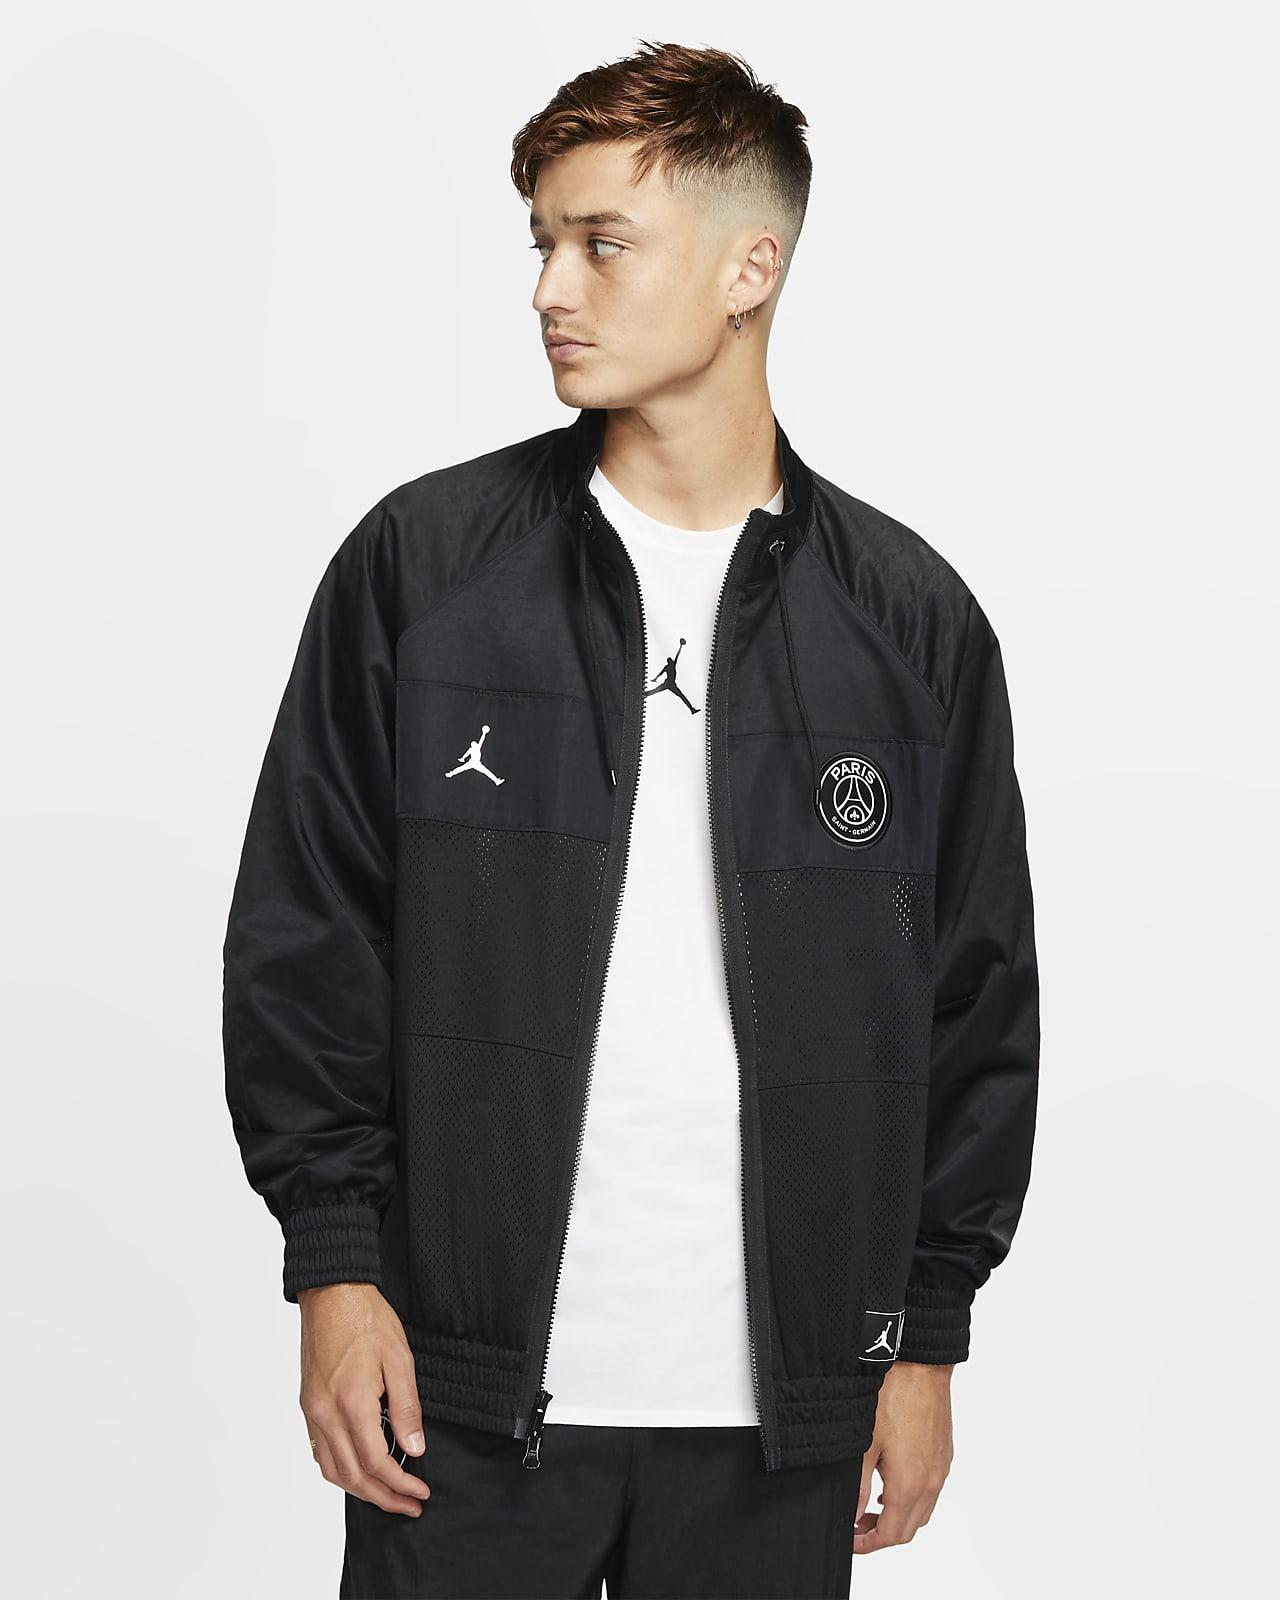 Paris Saint Germain Men's Coach Jacket. Nike NO